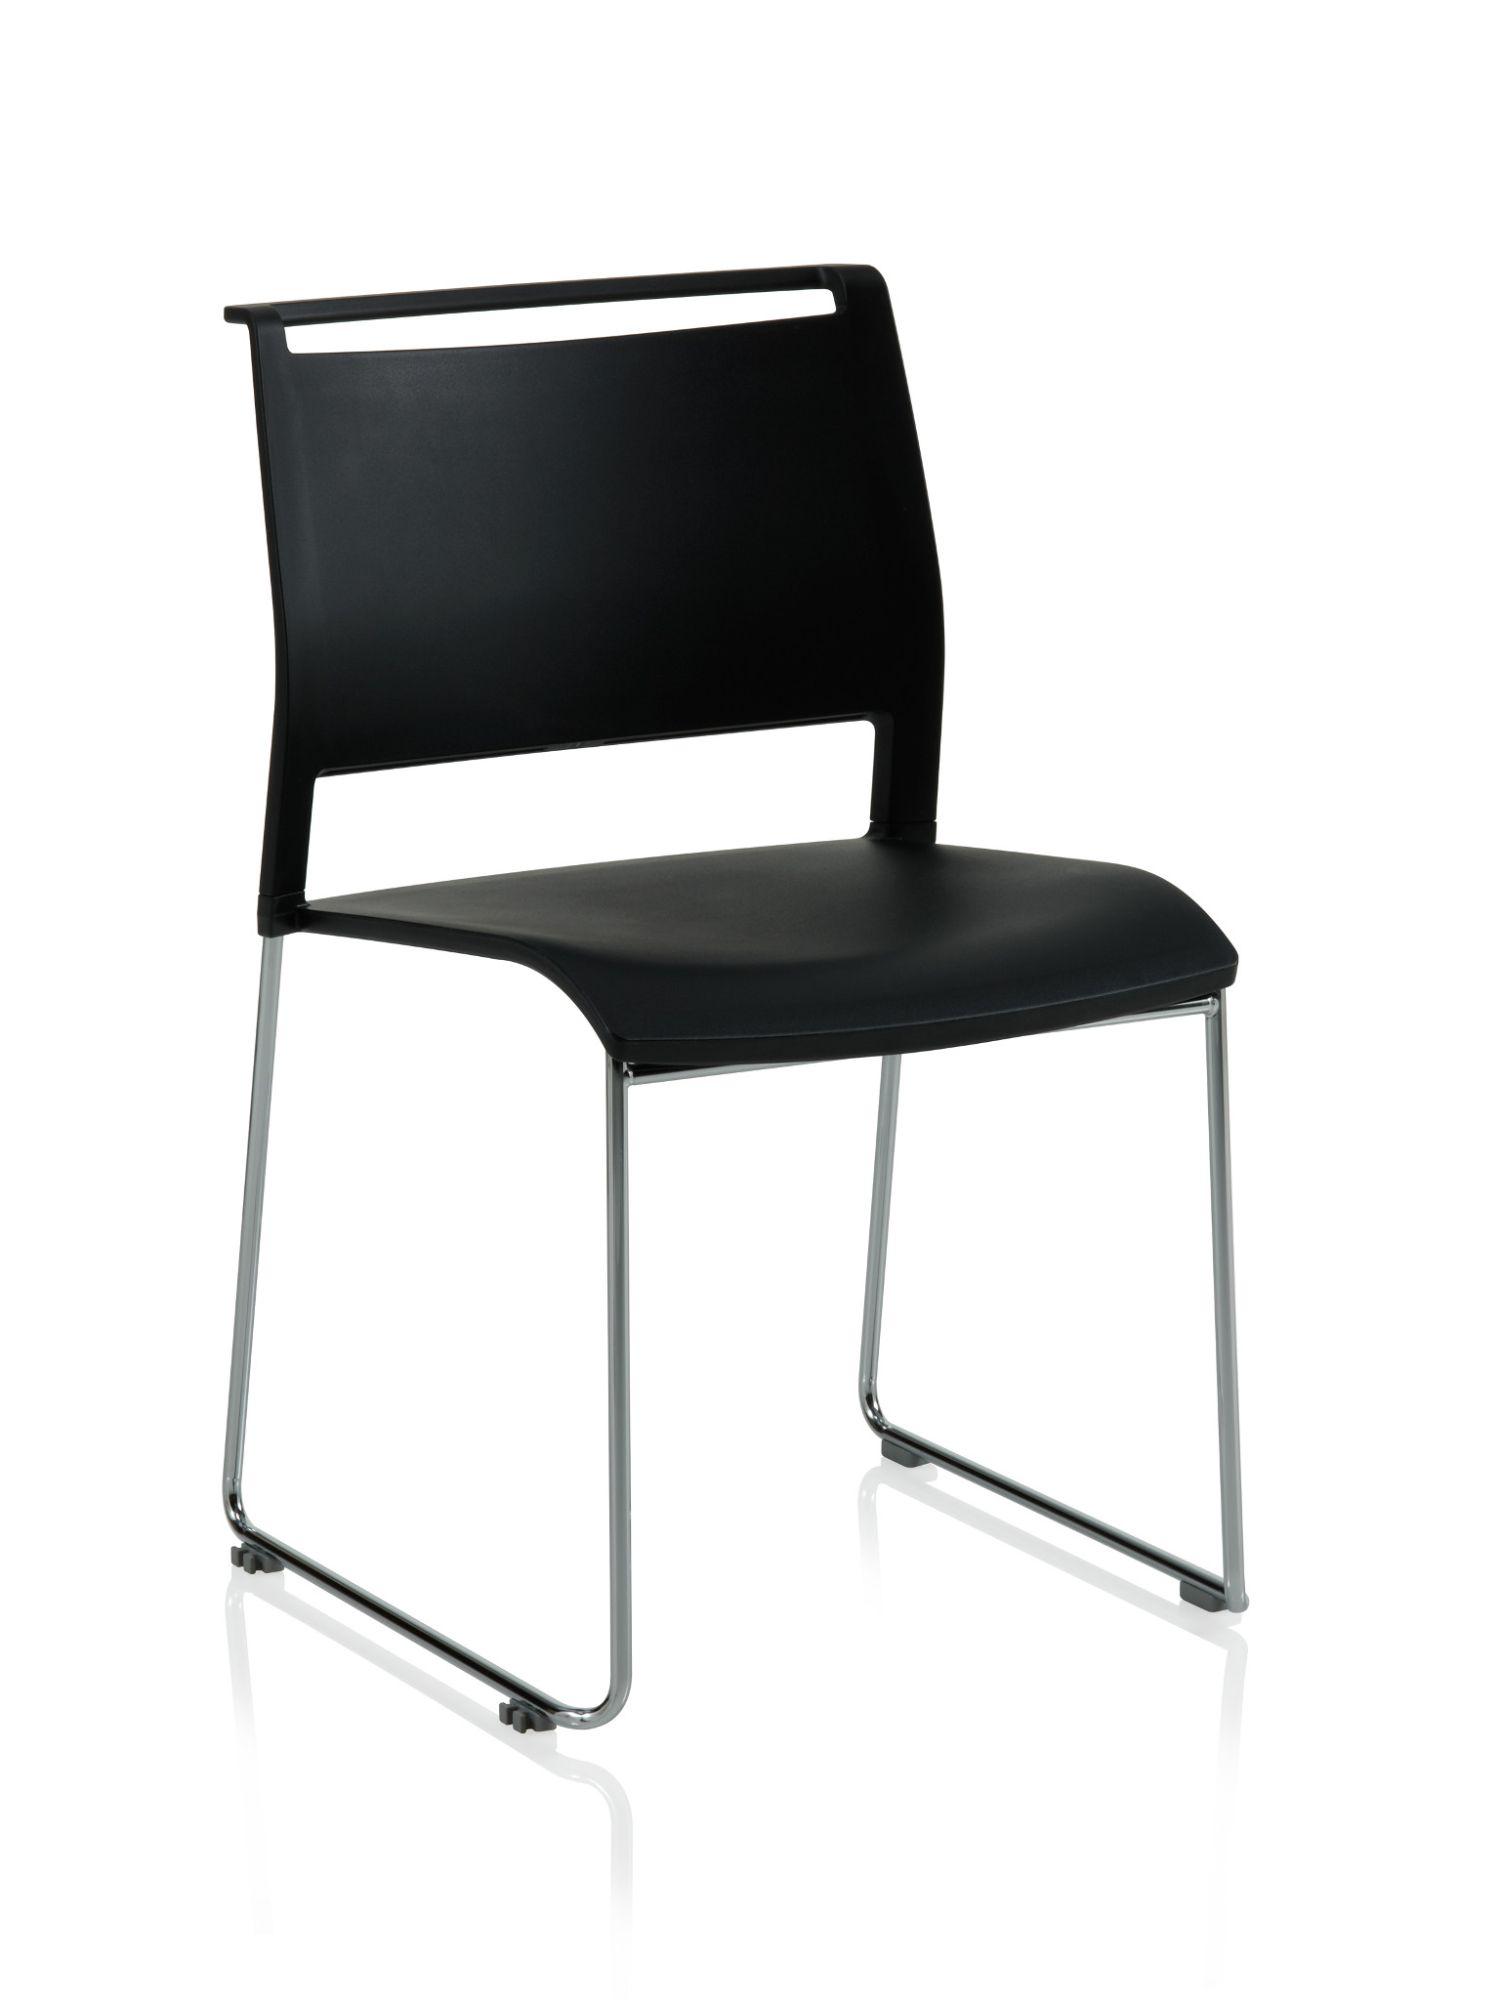 ki opt4 black high density stack chair